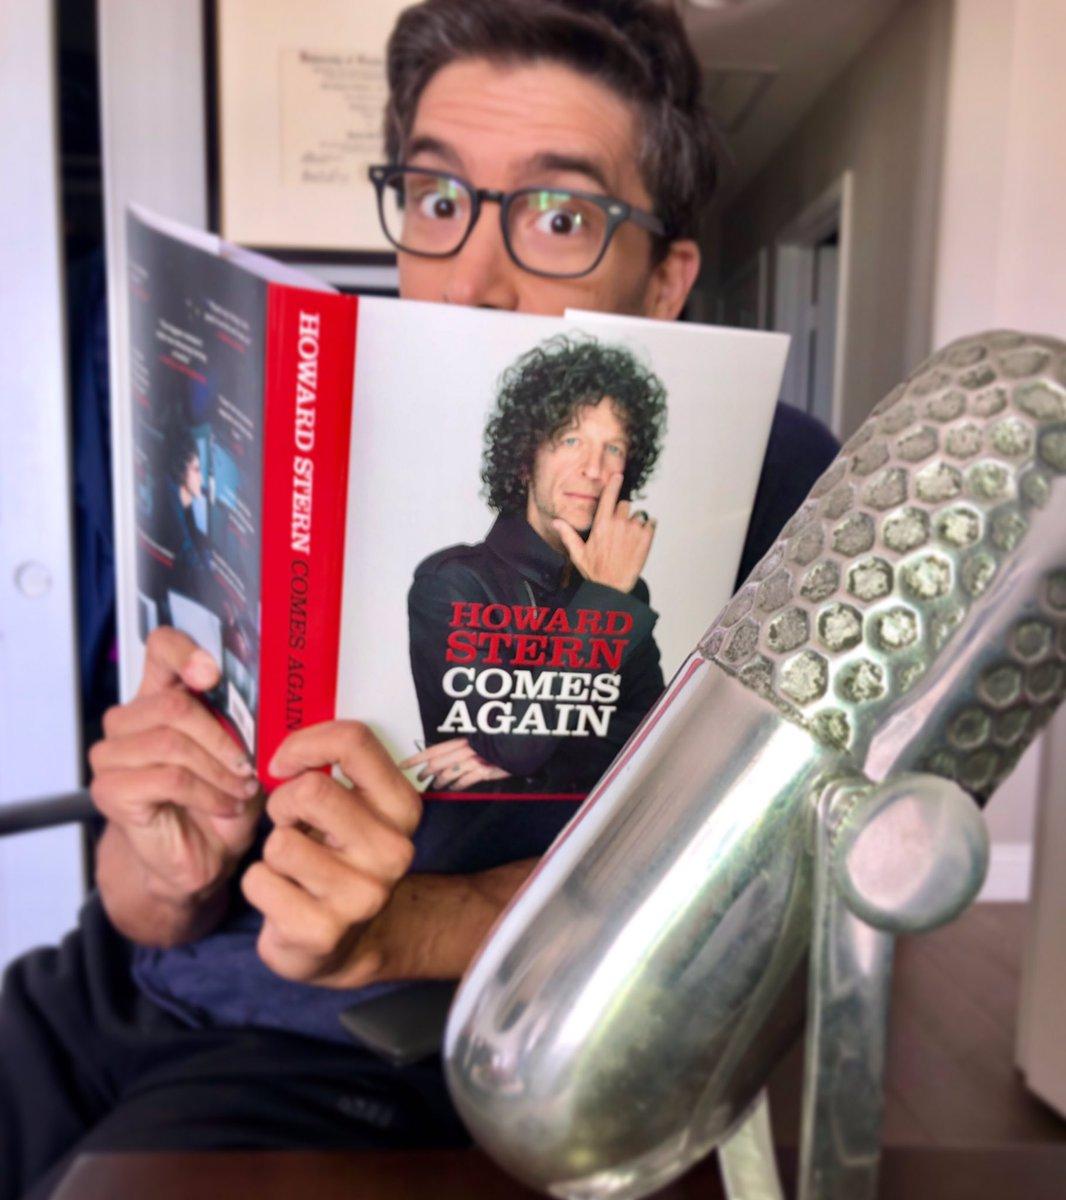 RT @RaoulFOX5: Please do not disturb. I'm reading. #HowardSternComesAgain @sternshow @HowardStern https://t.co/F8p7RcsmLT